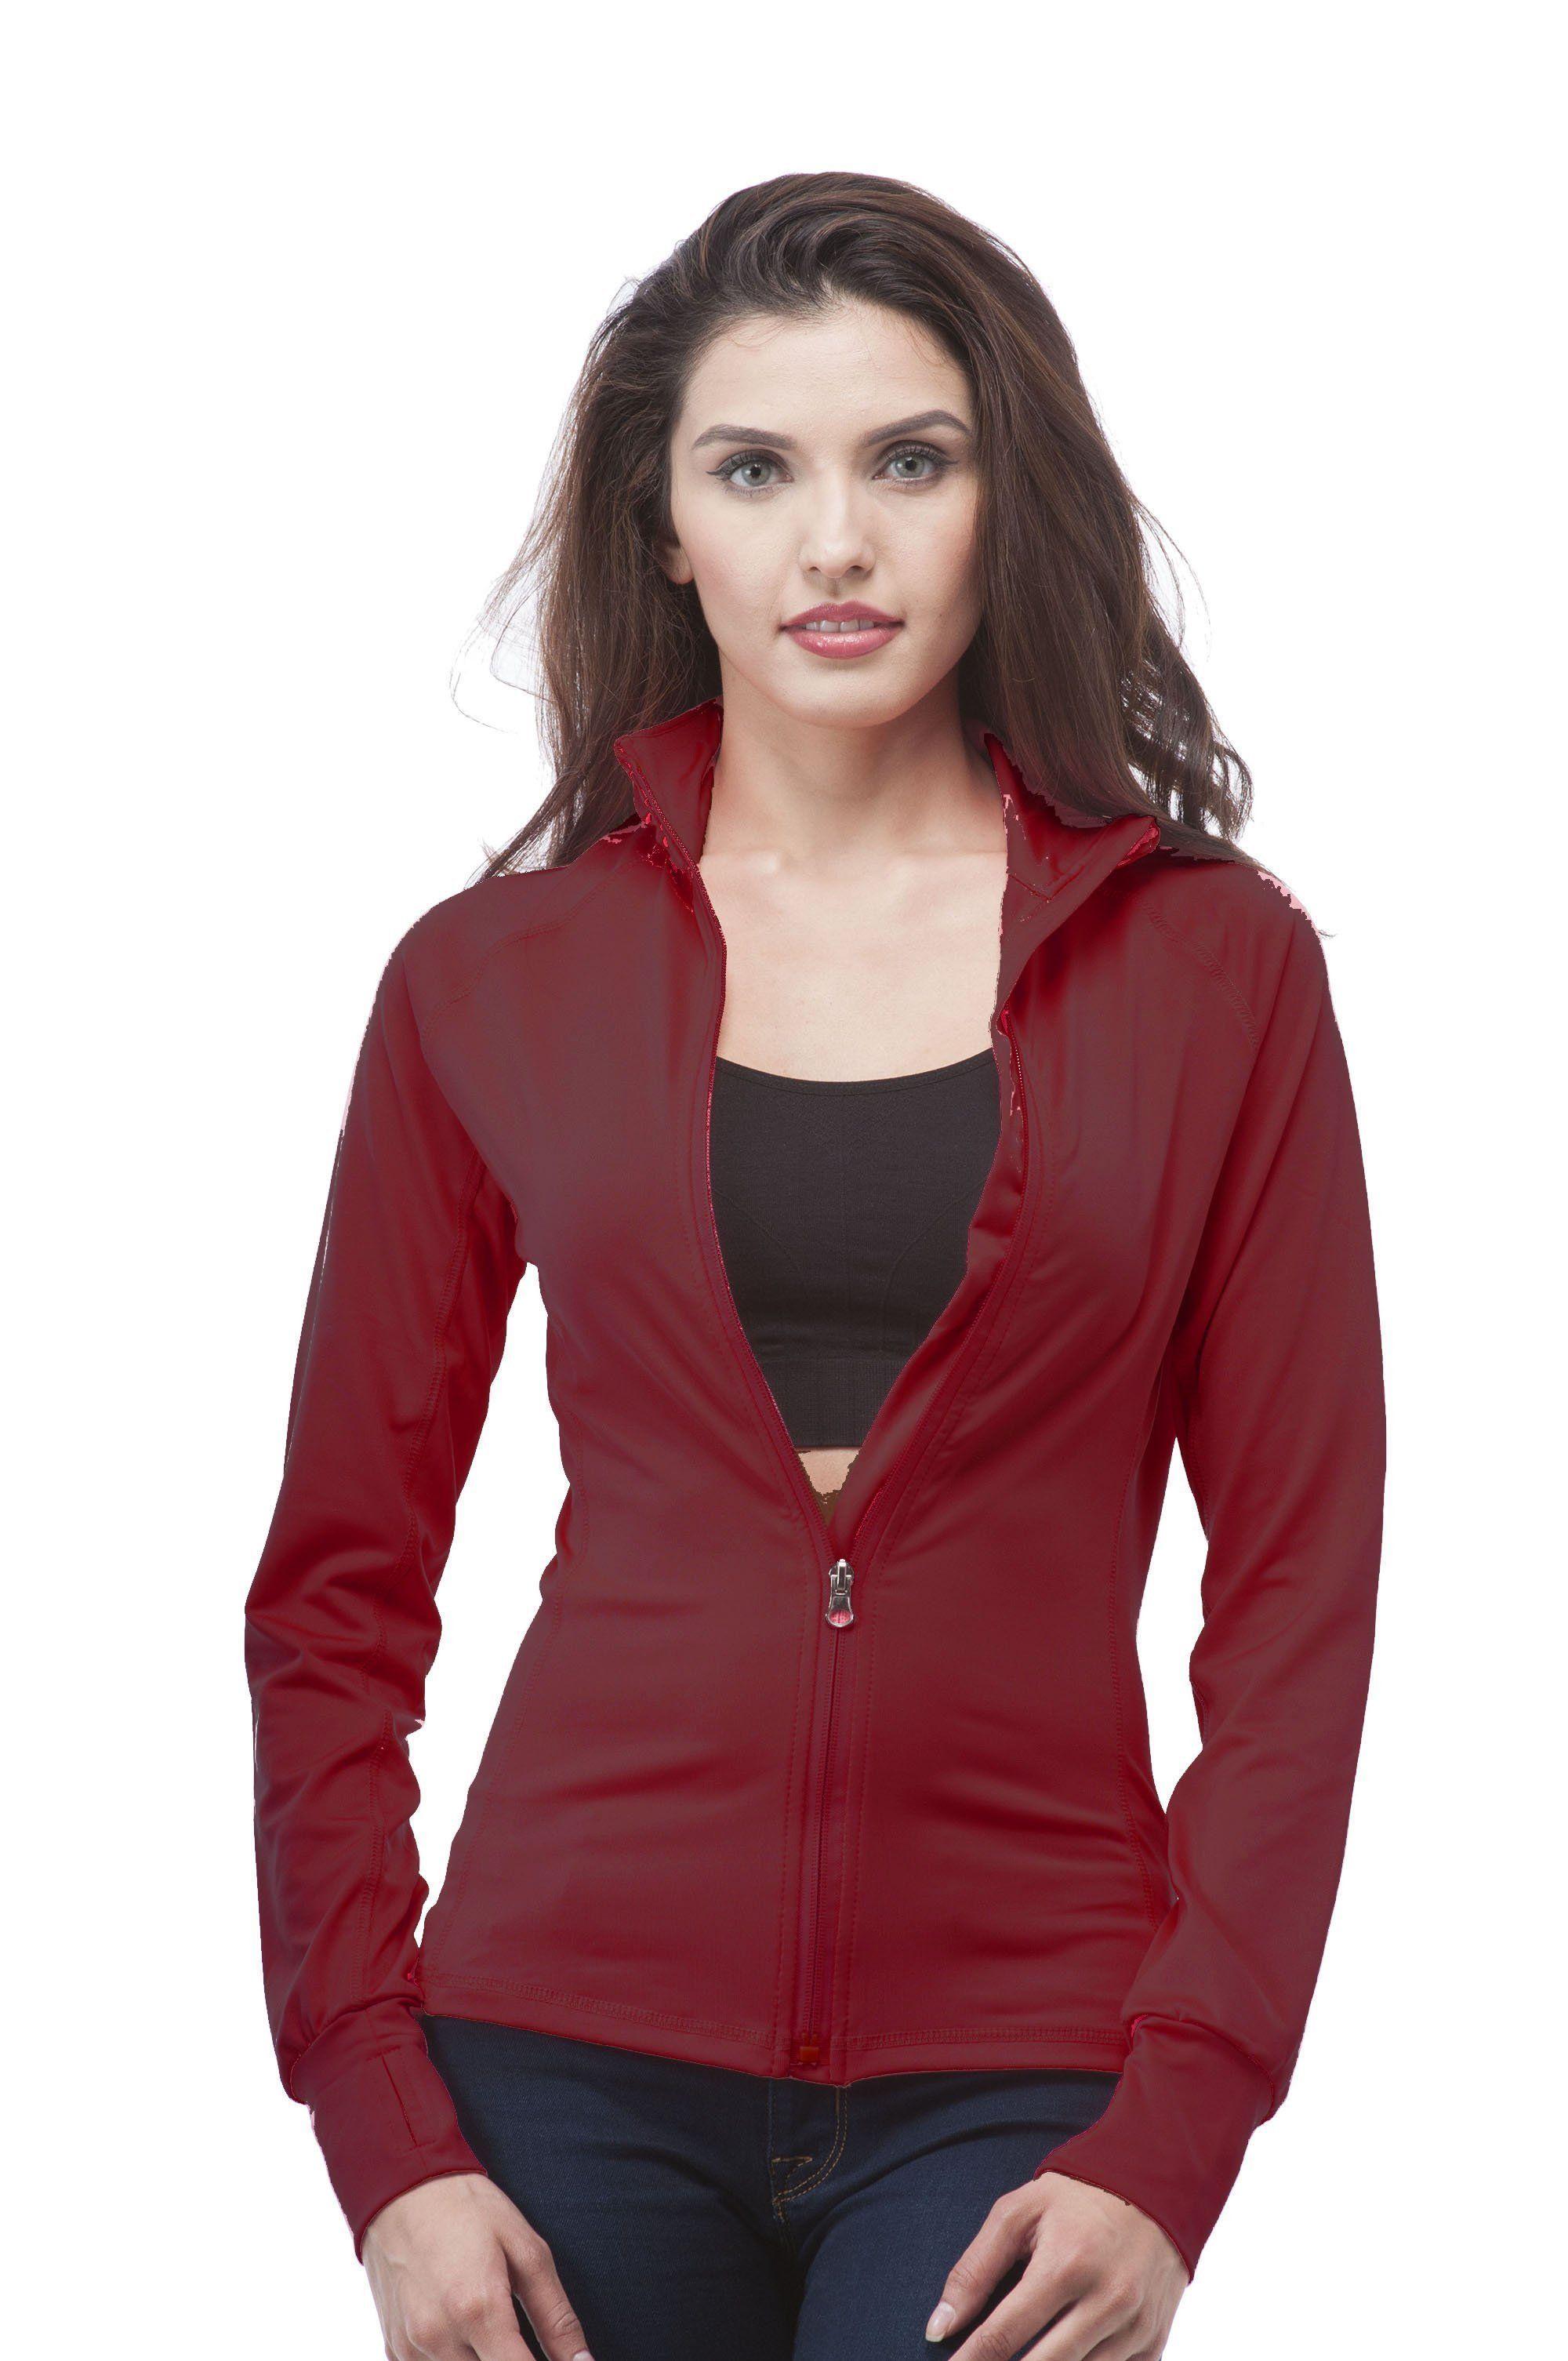 Long Sleeve Zip up Athletic wear sweater jacket Long